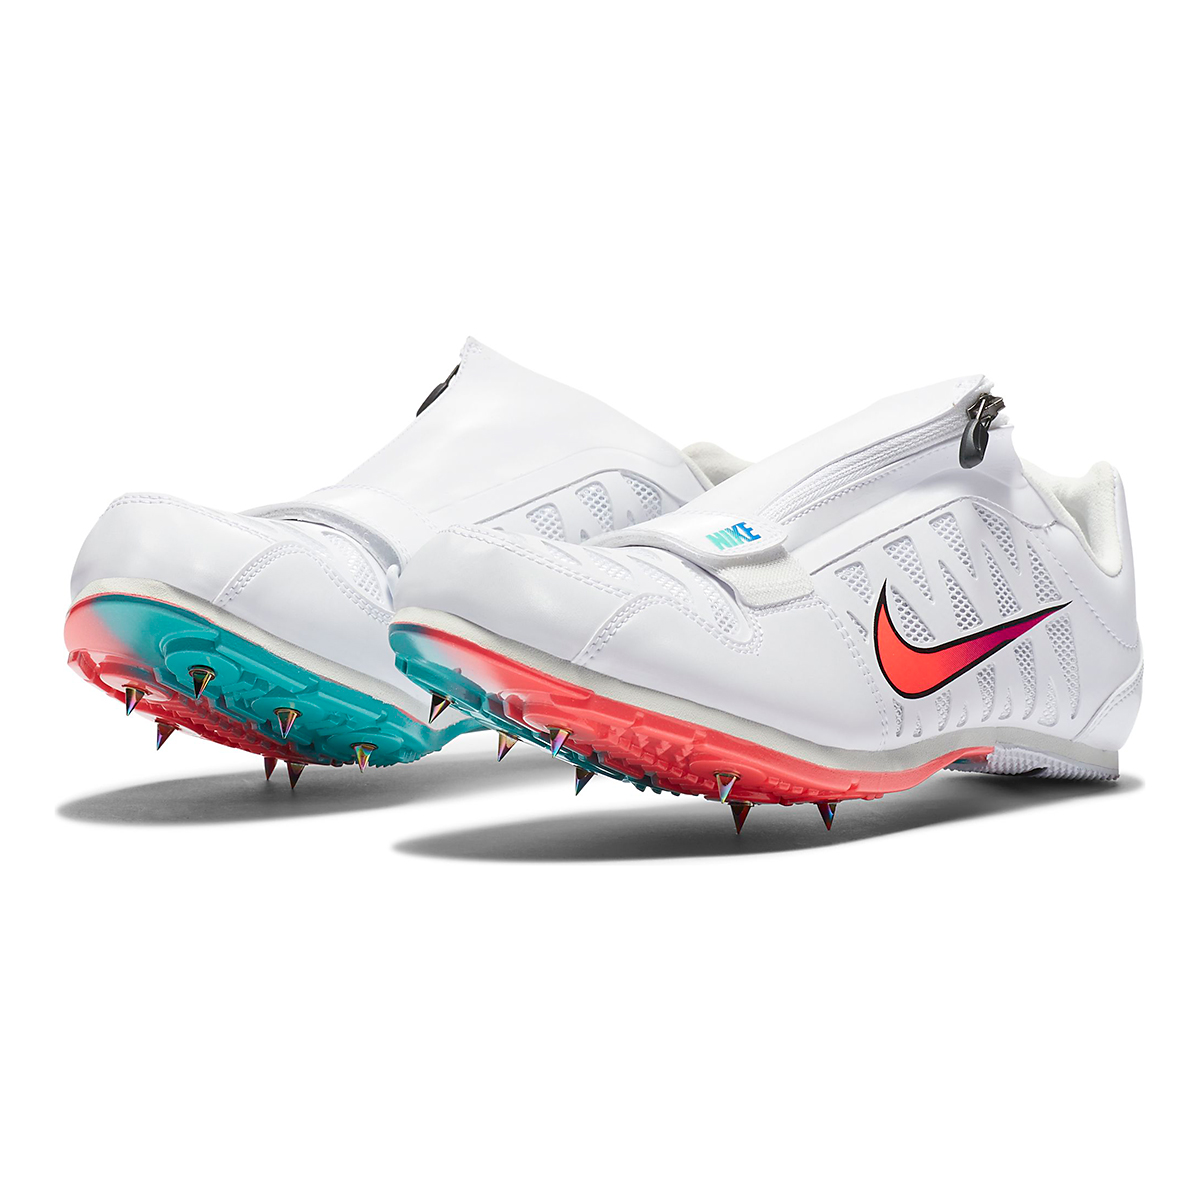 Nike Zoom Long Jump 4 Track Spikes - Color: White/Flash Crimson - Size: M4/W5.5 - Width: Regular, White/Flash Crimson, large, image 4